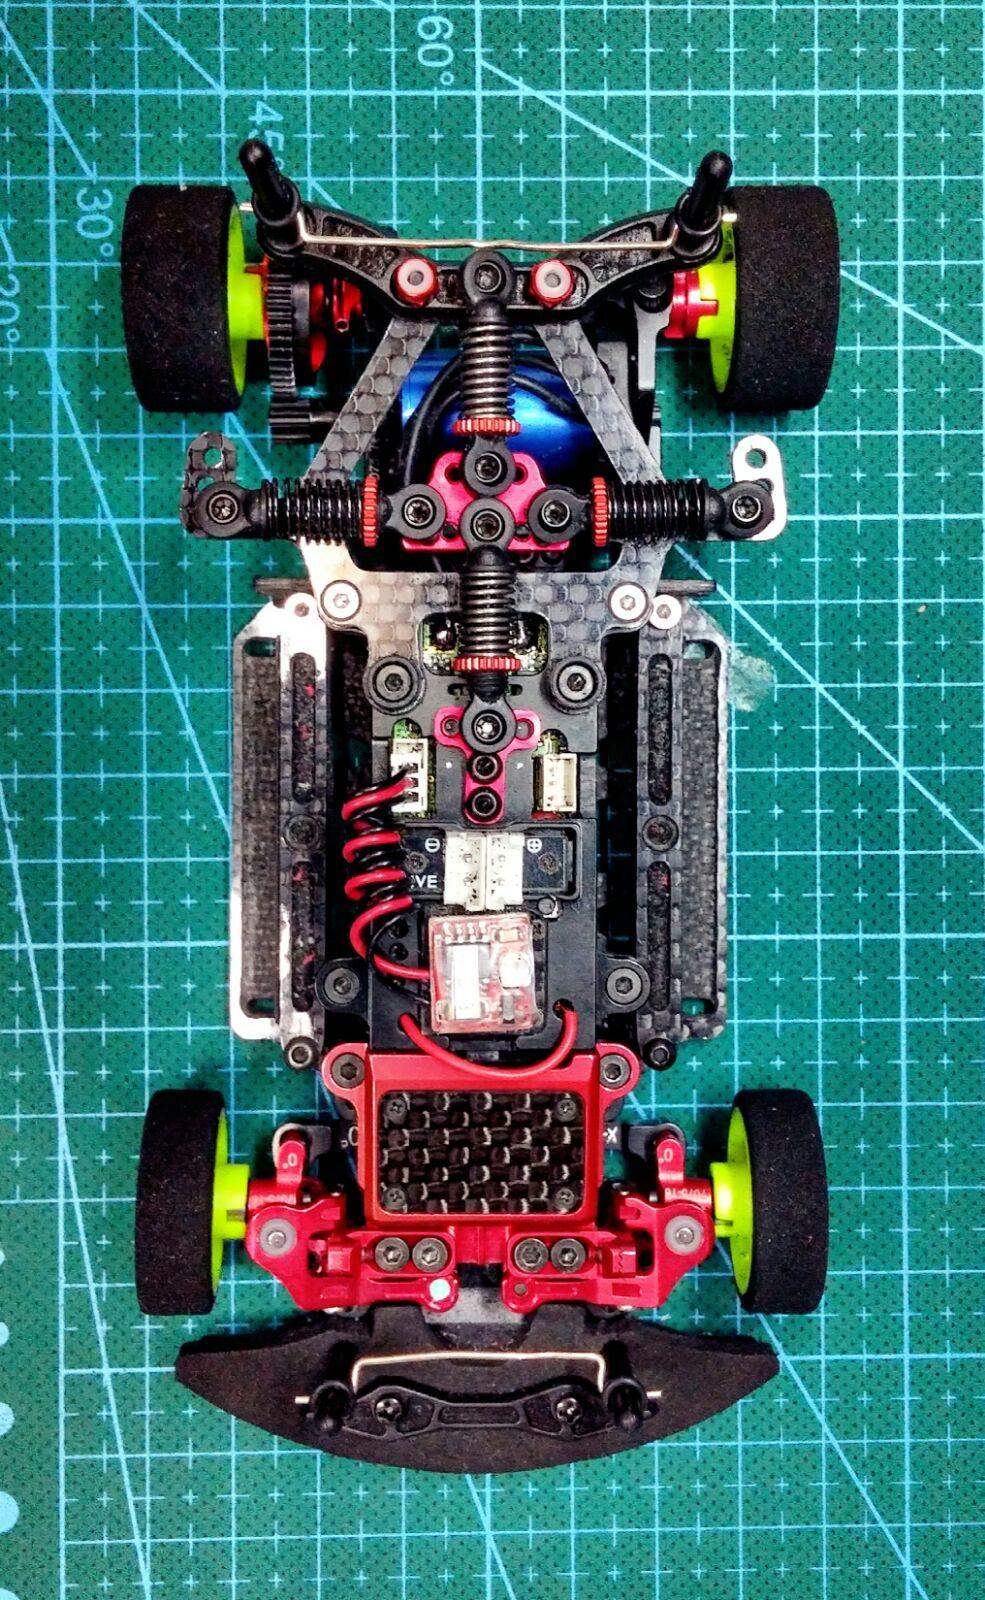 Pin by Lawrence Chu on Miniz Racing RC Rc cars, Rc cars